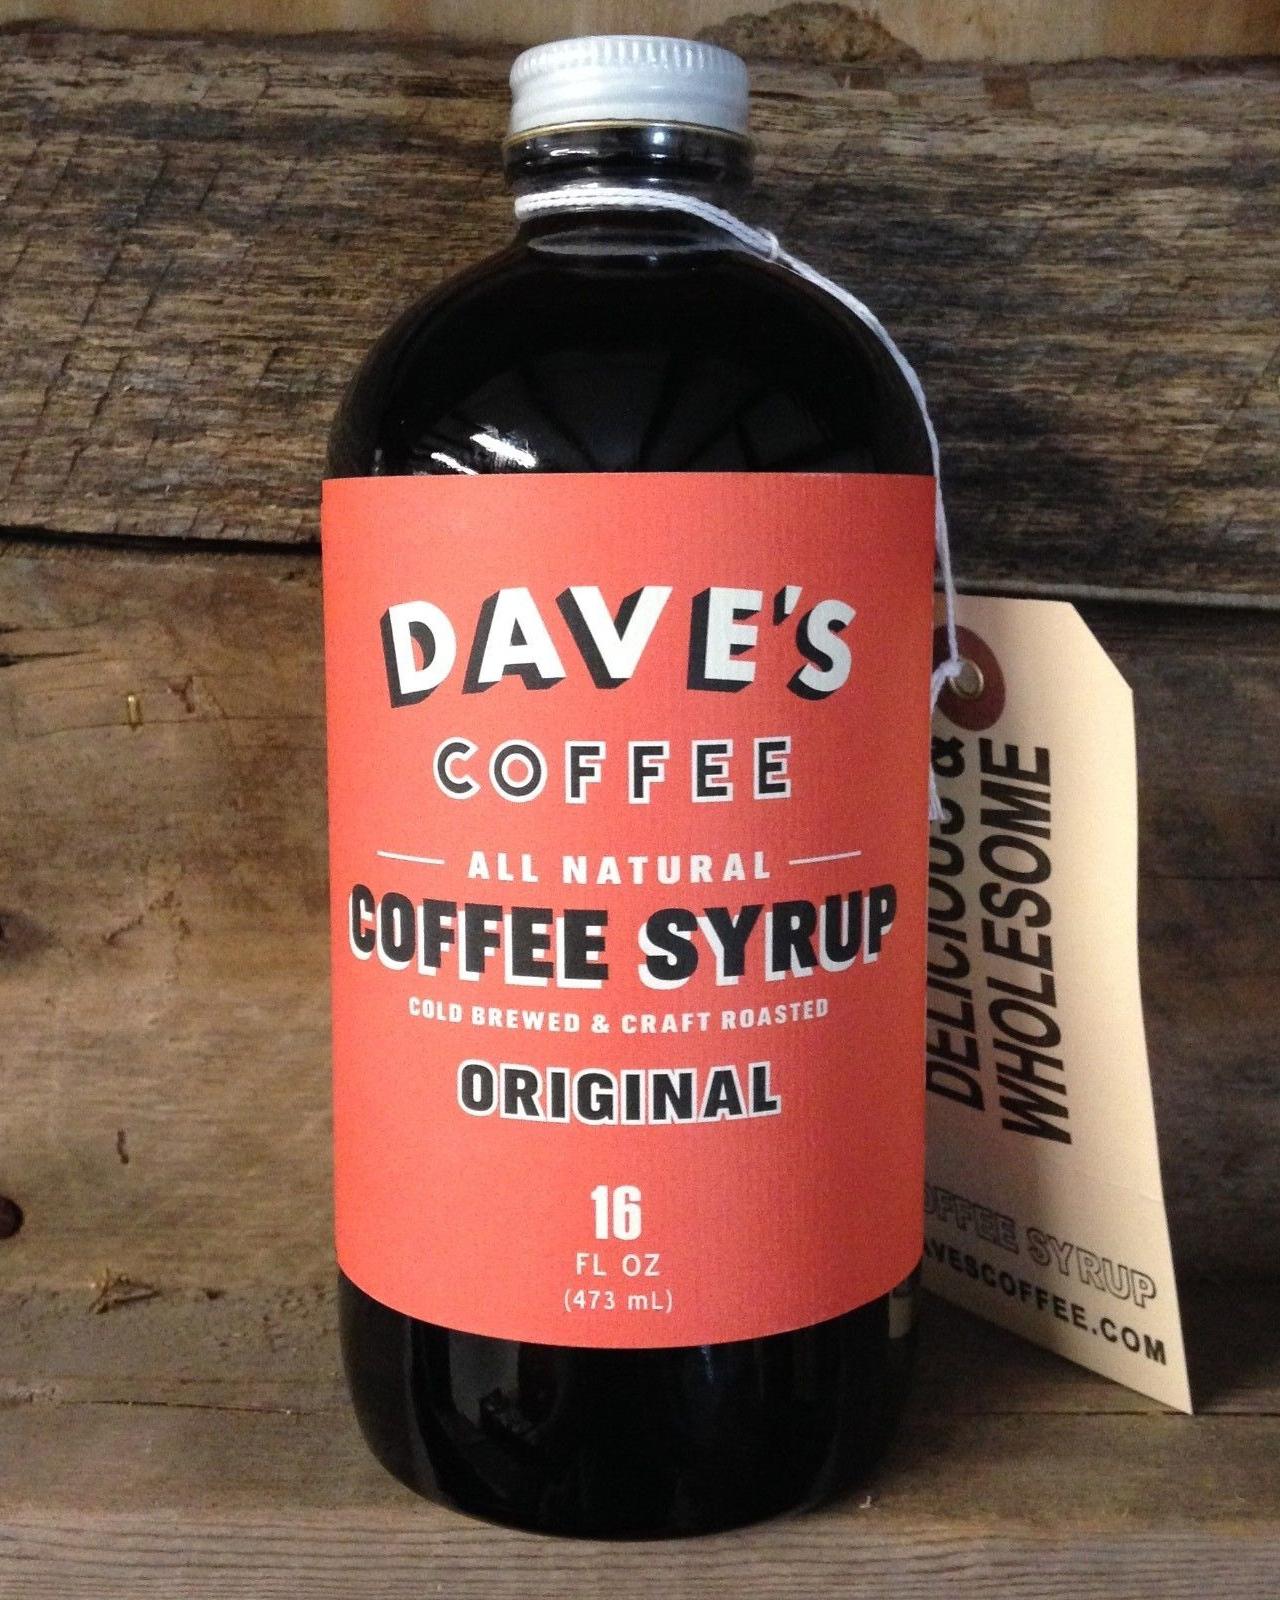 coffee-gift-guide-daves-coffee-syrup-1014.jpg